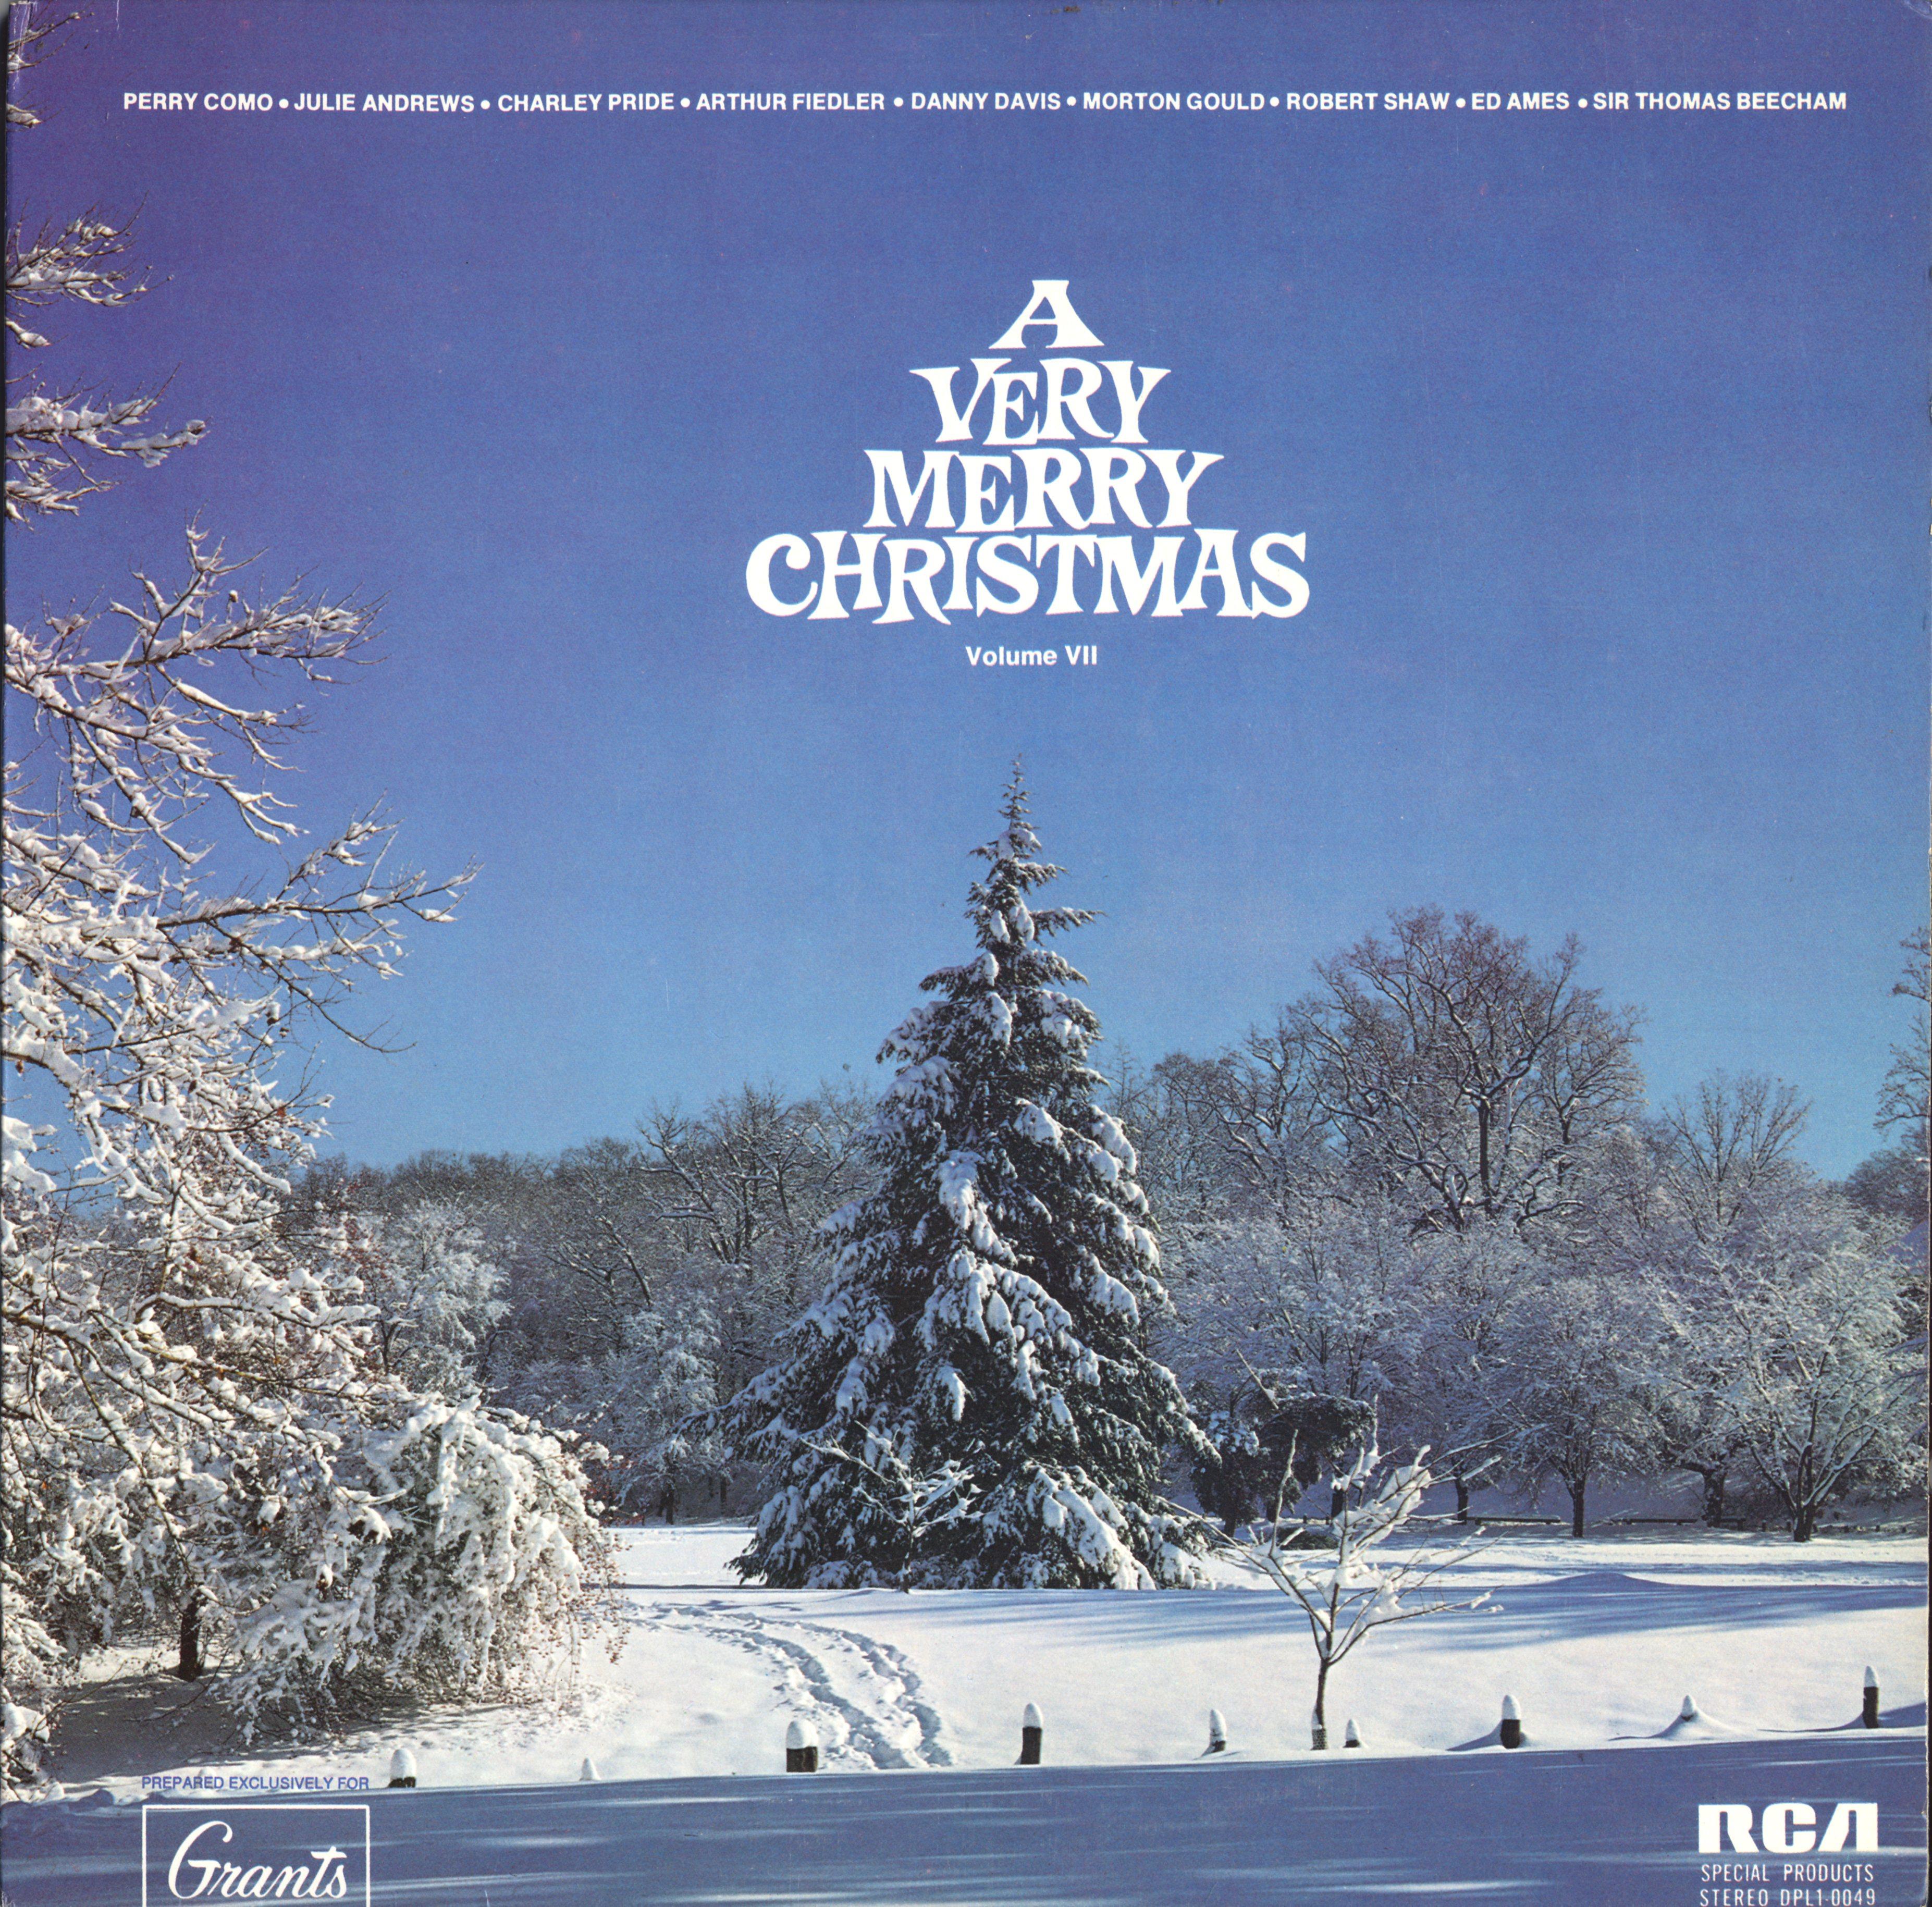 WT Grants Very Merry Christmas CD, Album, Record